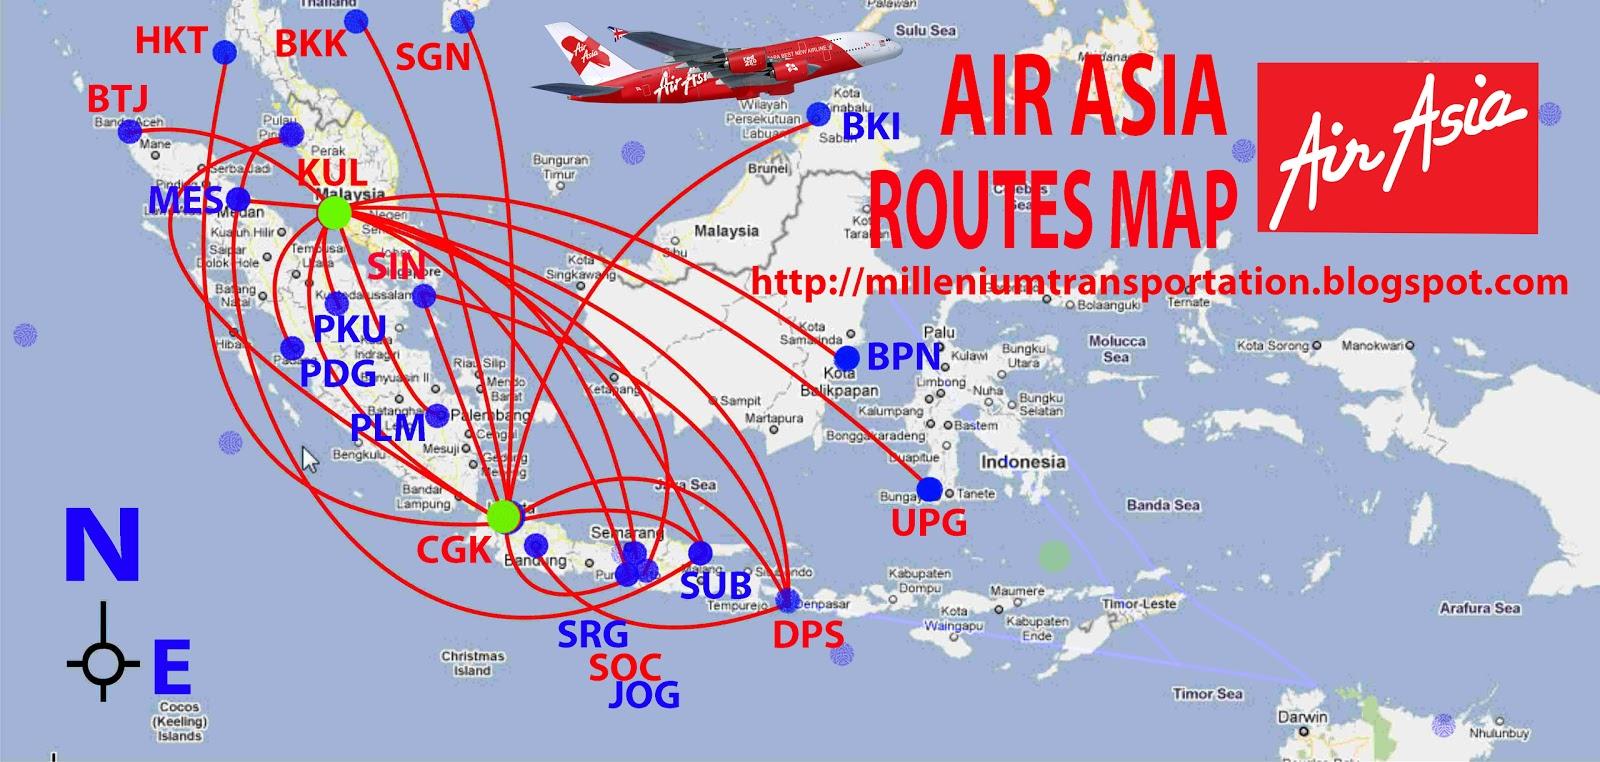 air asia 1 Don mueang airport (dmk) bangkok  row 14-15 - nok air terminal 1 (international flights) all international flights (including airasia.